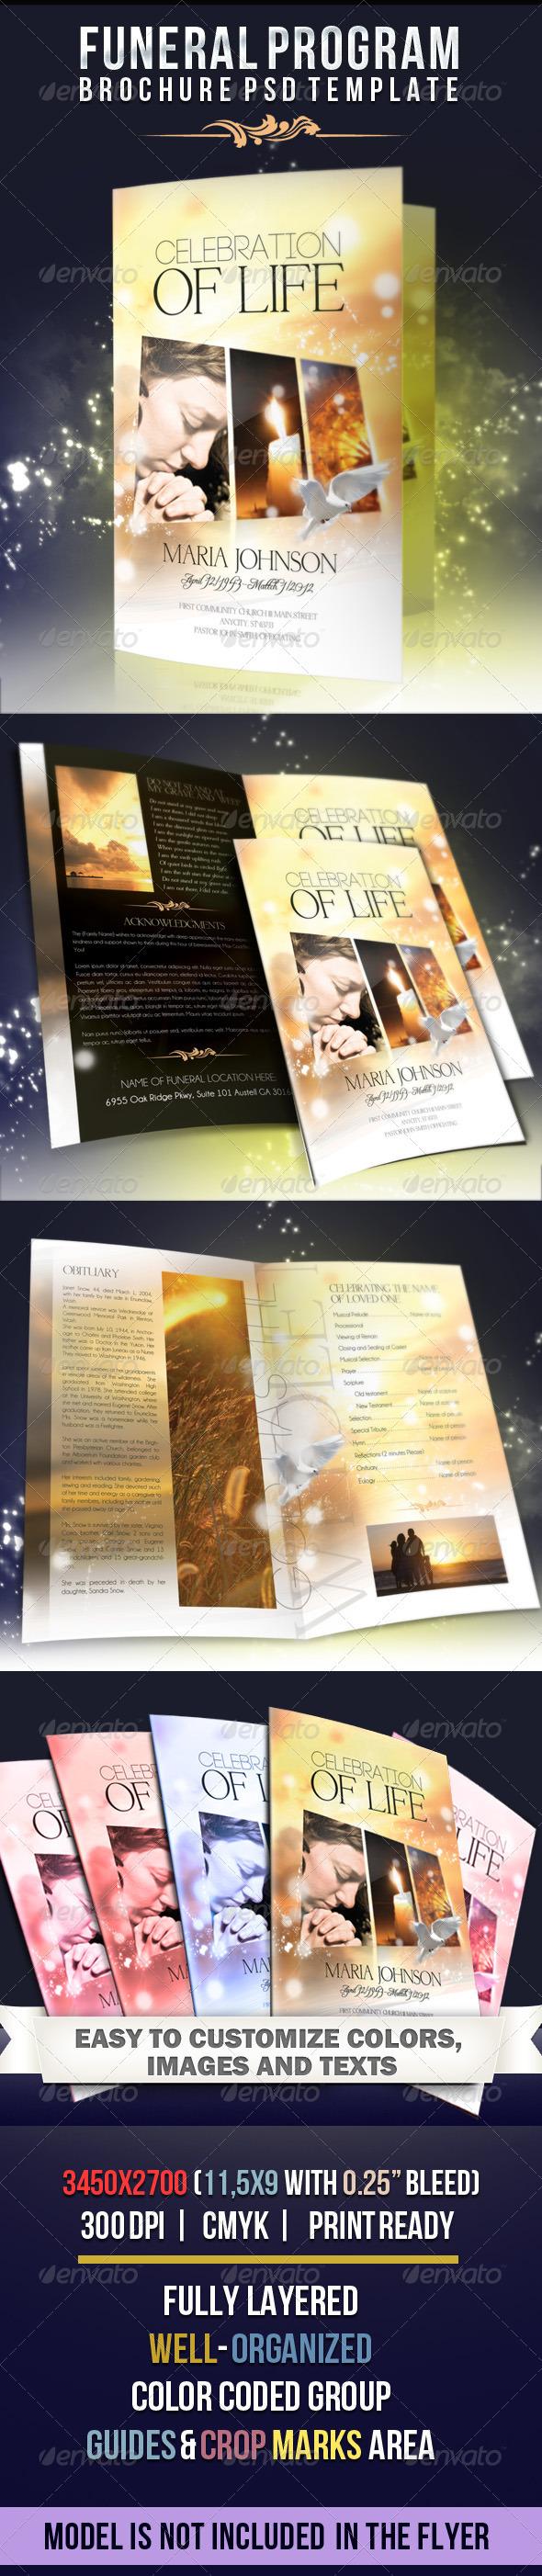 GraphicRiver Celebration of life Funeral Program Brochure Template 2549525